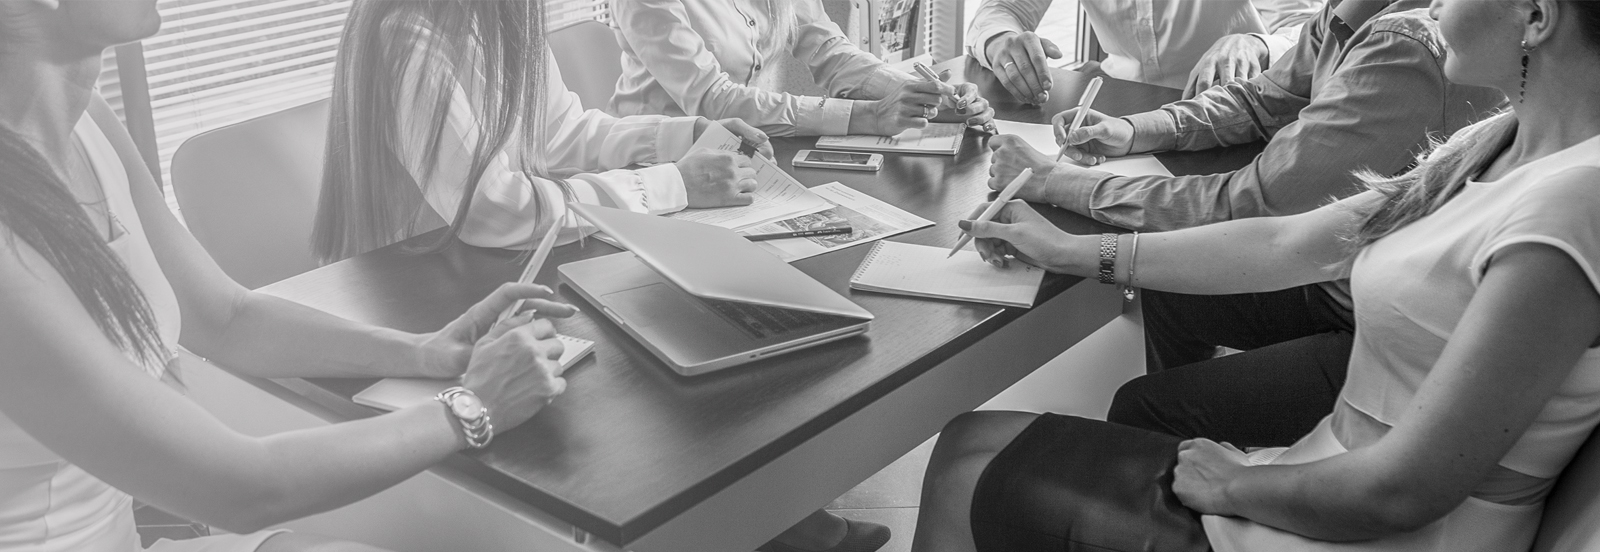 Banking Career Opportunities | Bank Jobs in CT | Windsor Federal